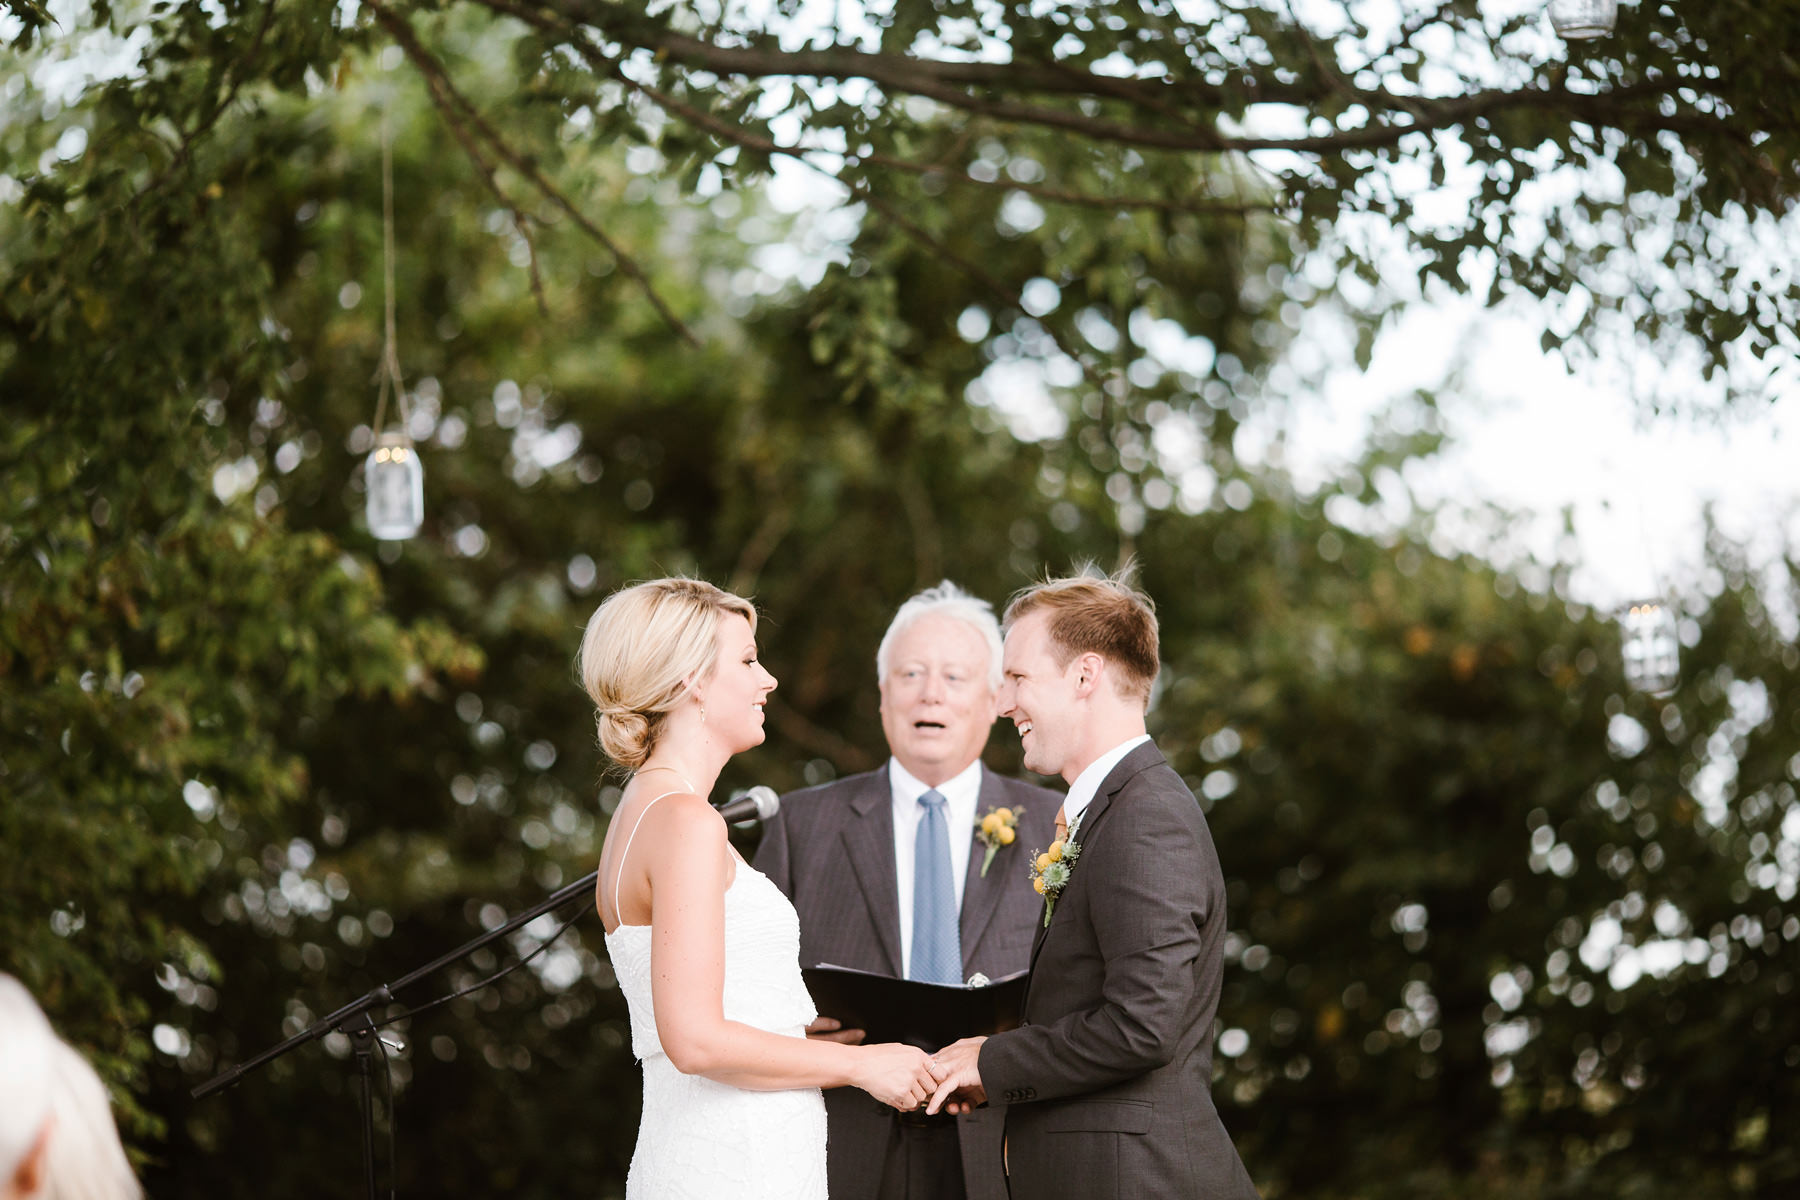 Alldredge Orchard Kansas City_Kindling Wedding Photography BLOG 45.JPG